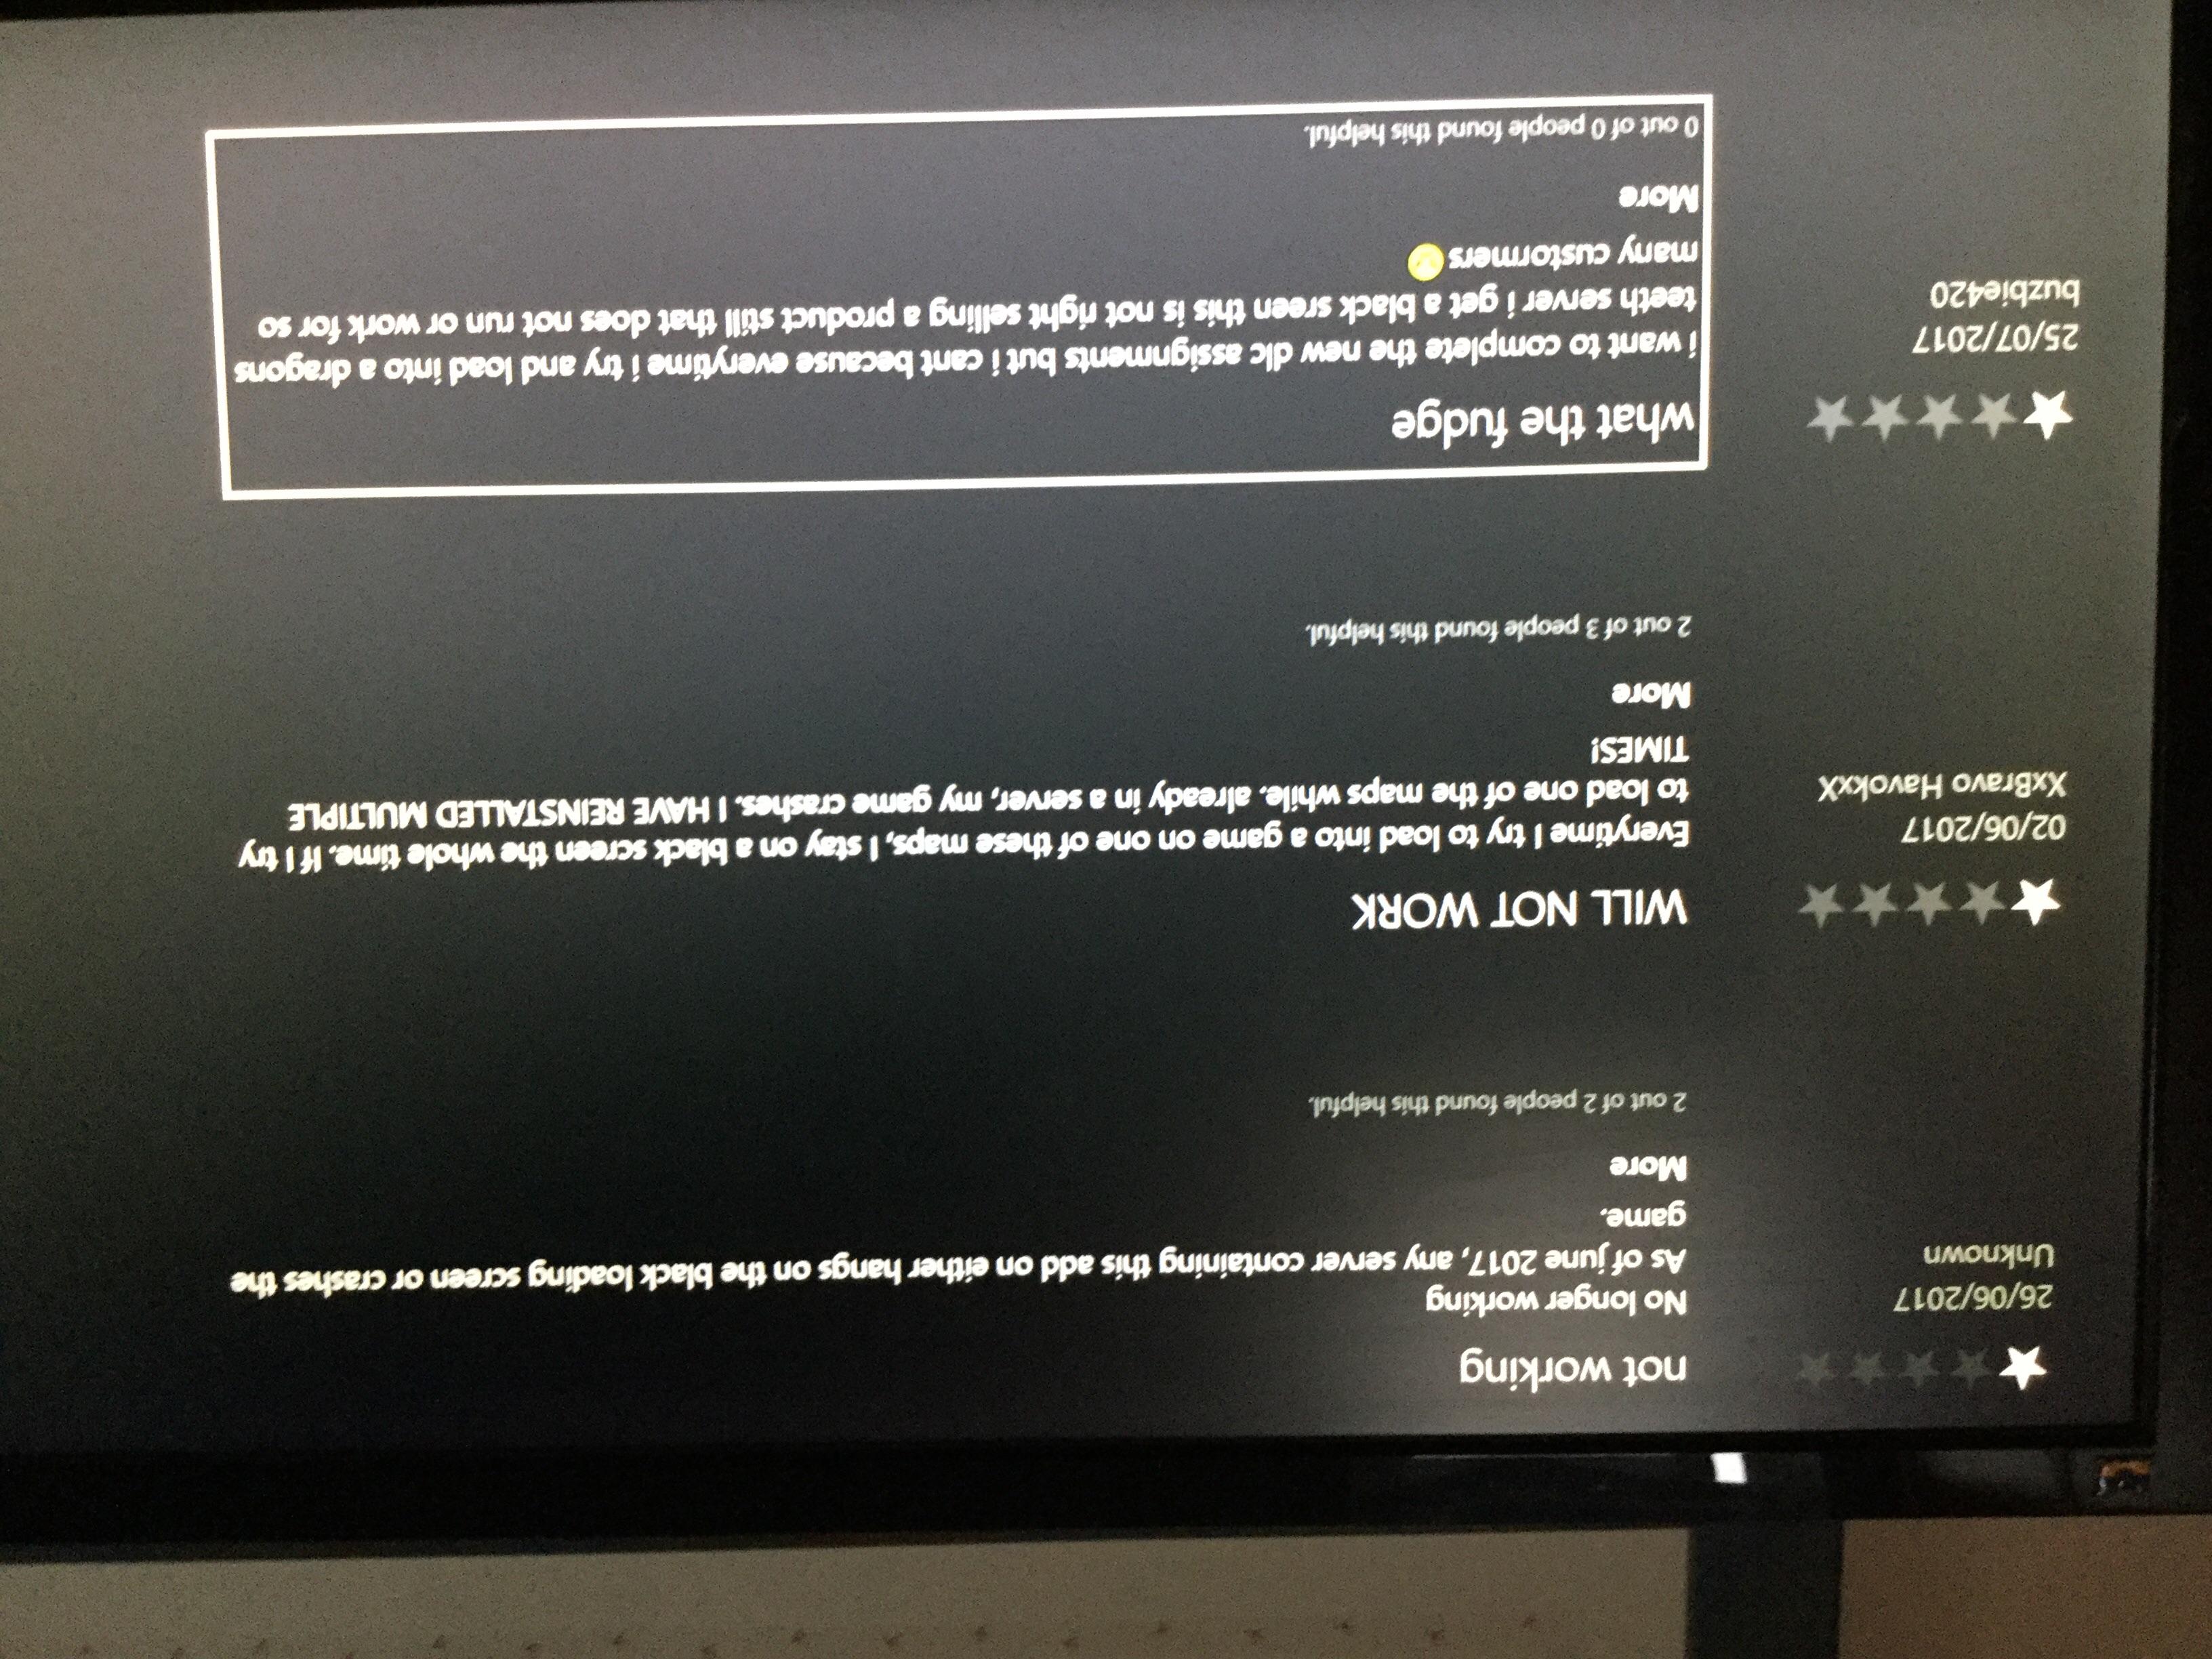 Fortnite Stuck On Loading Screen Mac stuck on infinite loading screen on xbox one. - answer hq